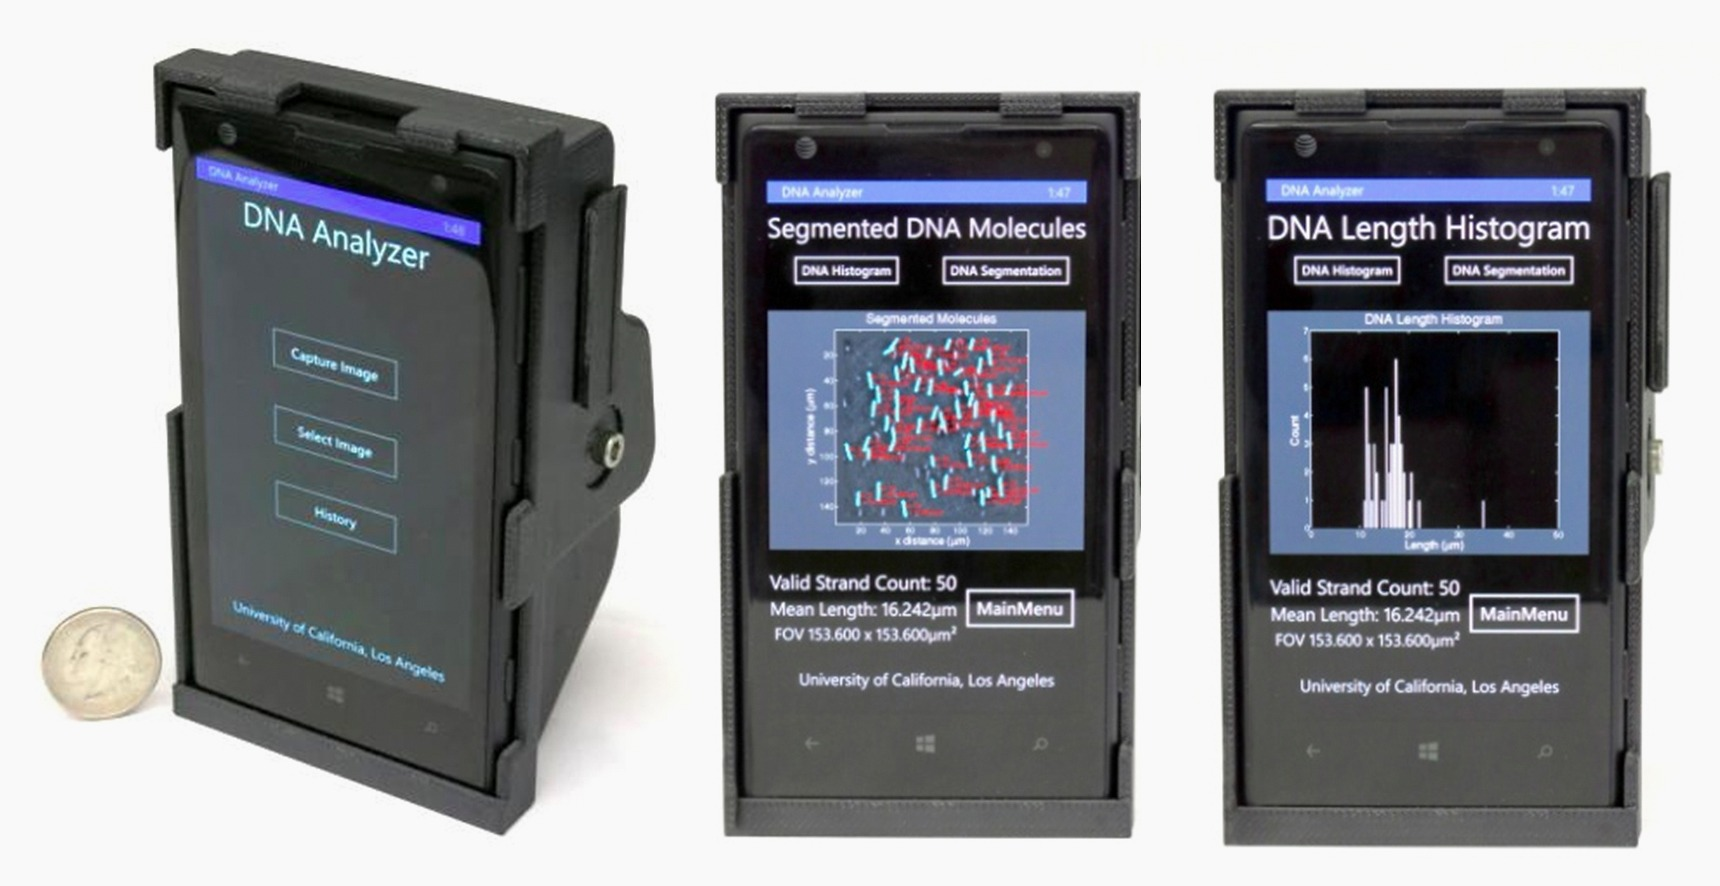 smartphone-microscope-screens_colorcorrected